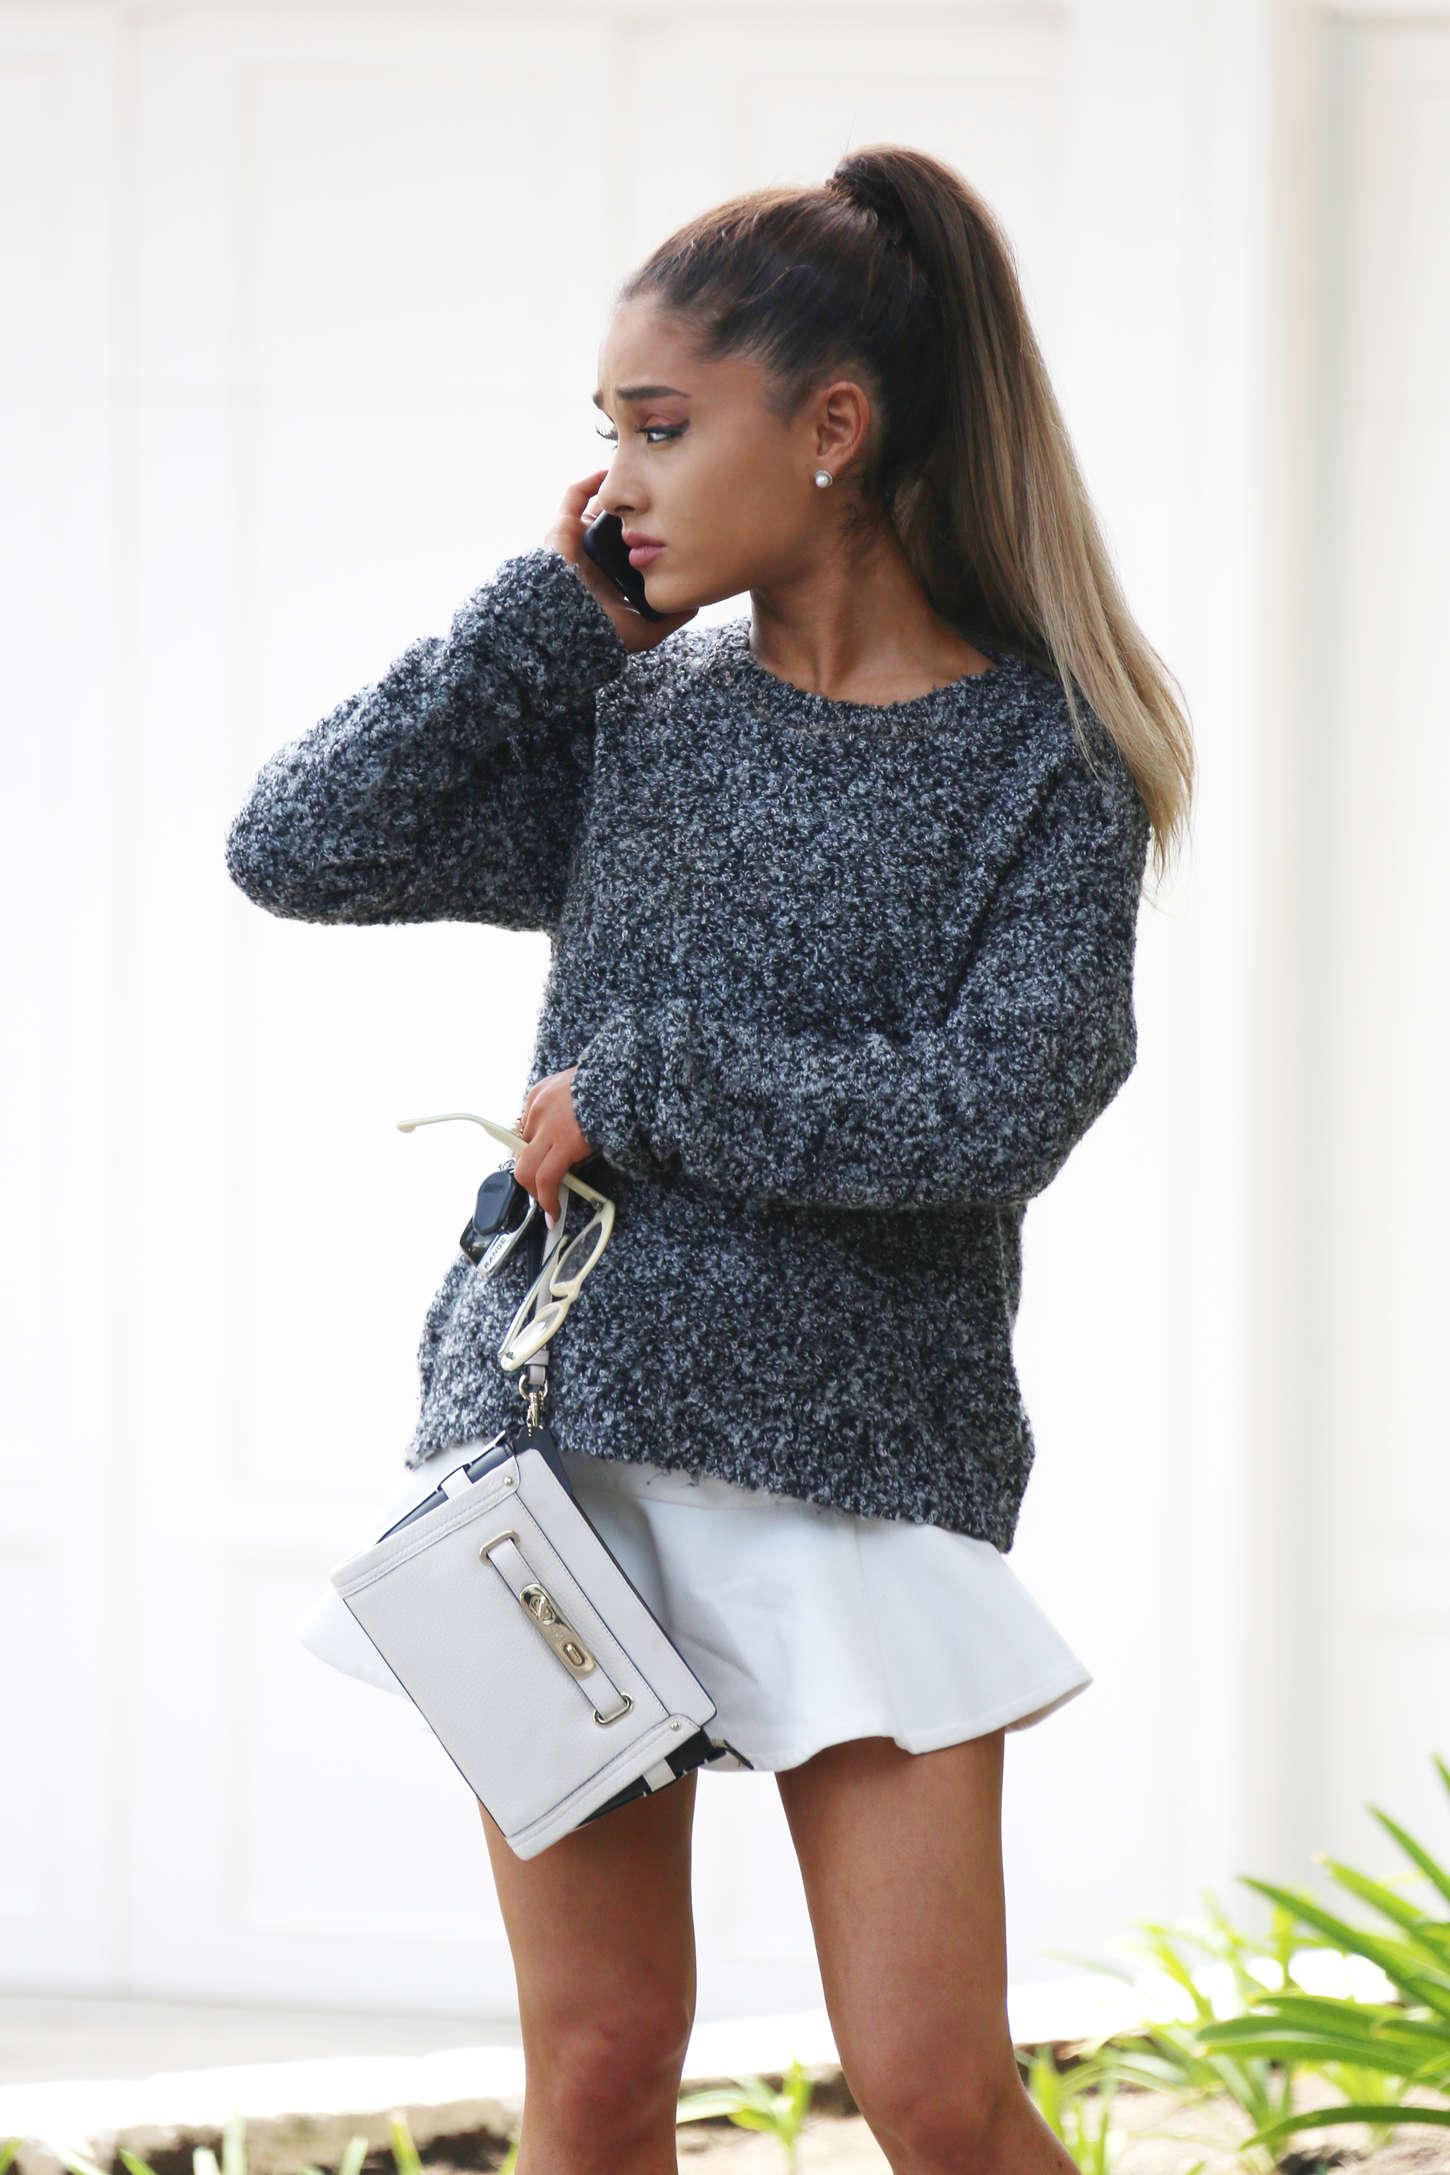 Mini Las Vegas >> Ariana Grande in White Mini Skirt -01 | GotCeleb